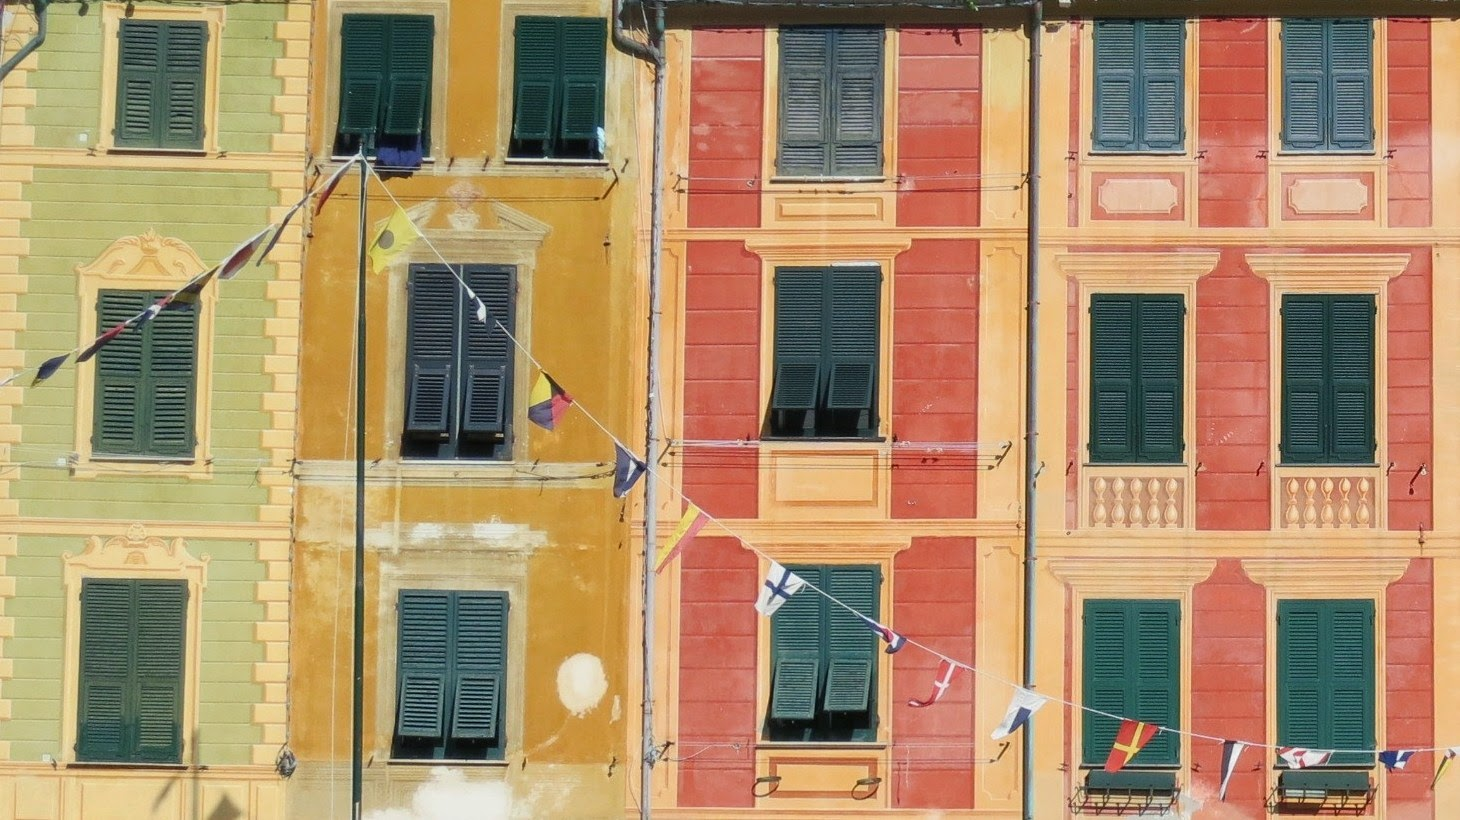 Portofino Colorful Ligurian Buildings